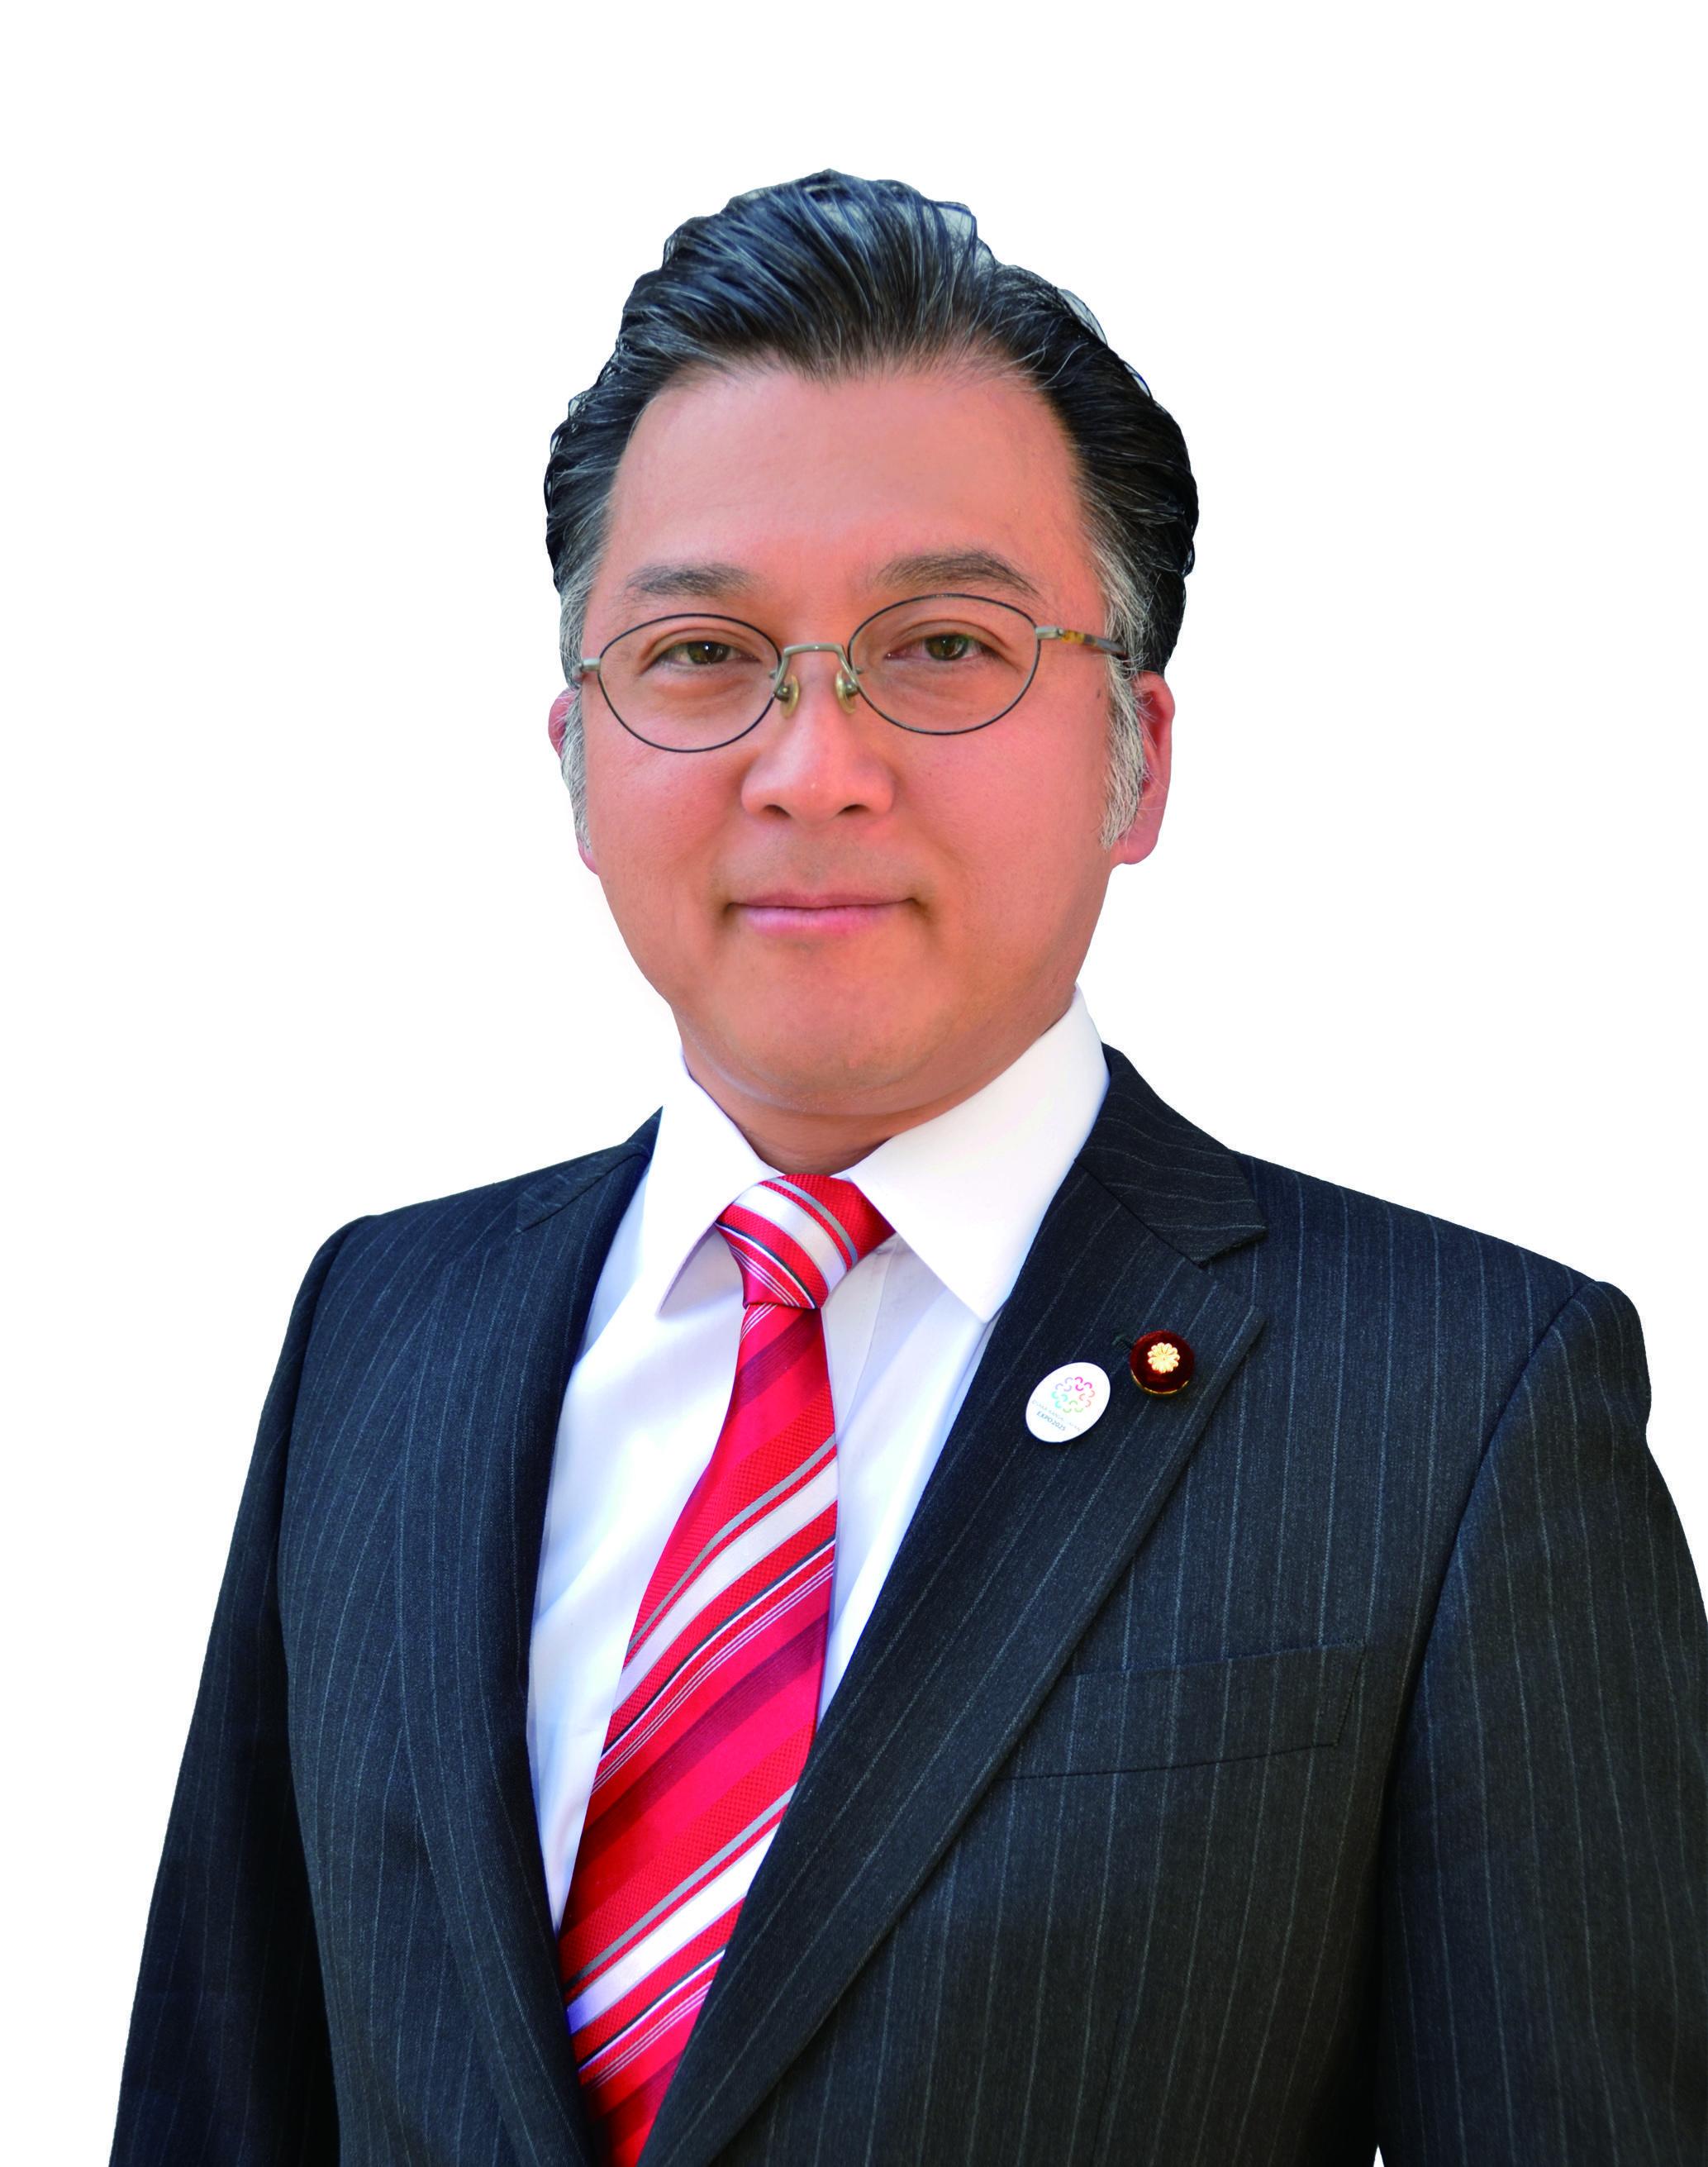 NHK「日曜討論」浦野靖人国会議員団政務調査会長 生出演のお知らせ